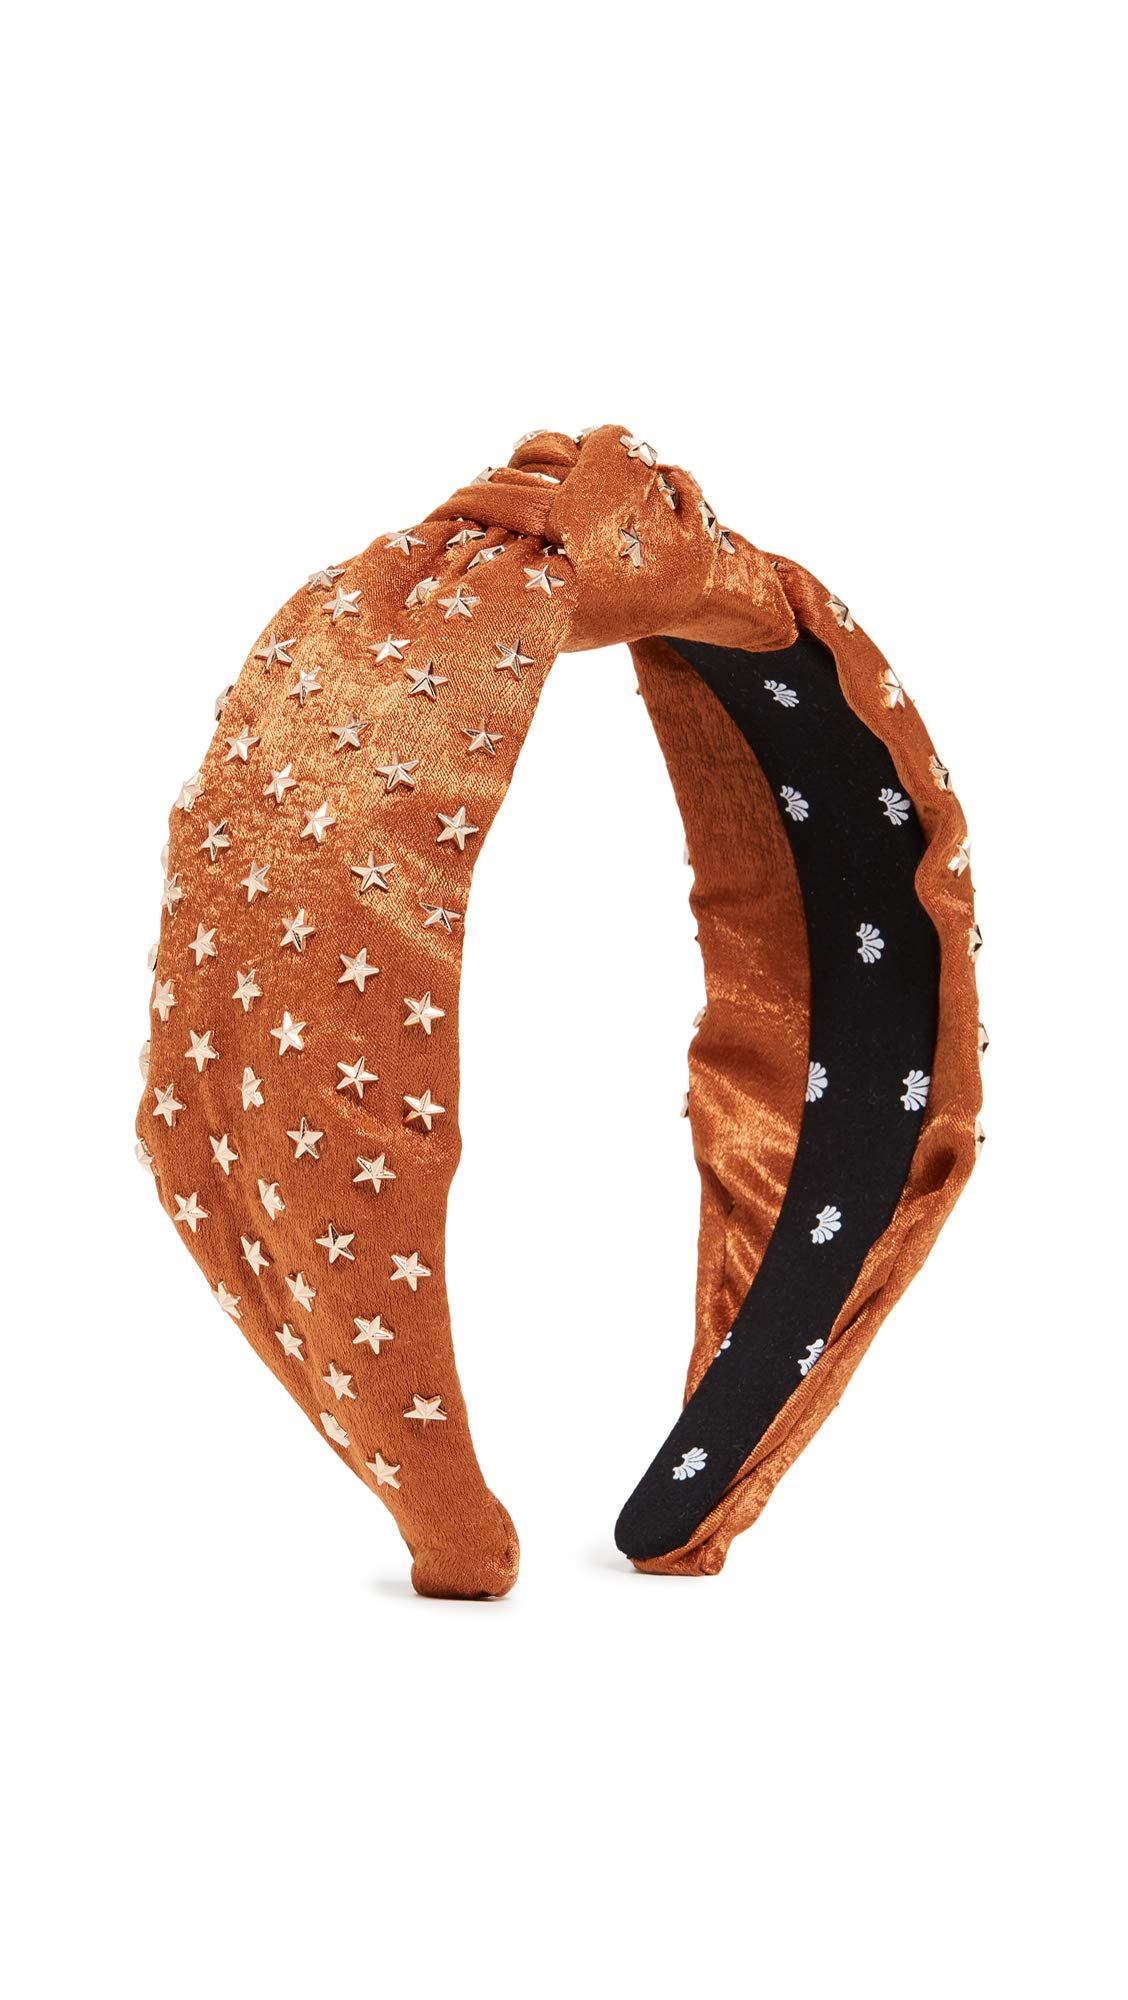 Lele Sadoughi Women's Star Studded Silk Knotted Headband, Copper, Metallic, Bronze, Orange, One Size by Lele Sadoughi